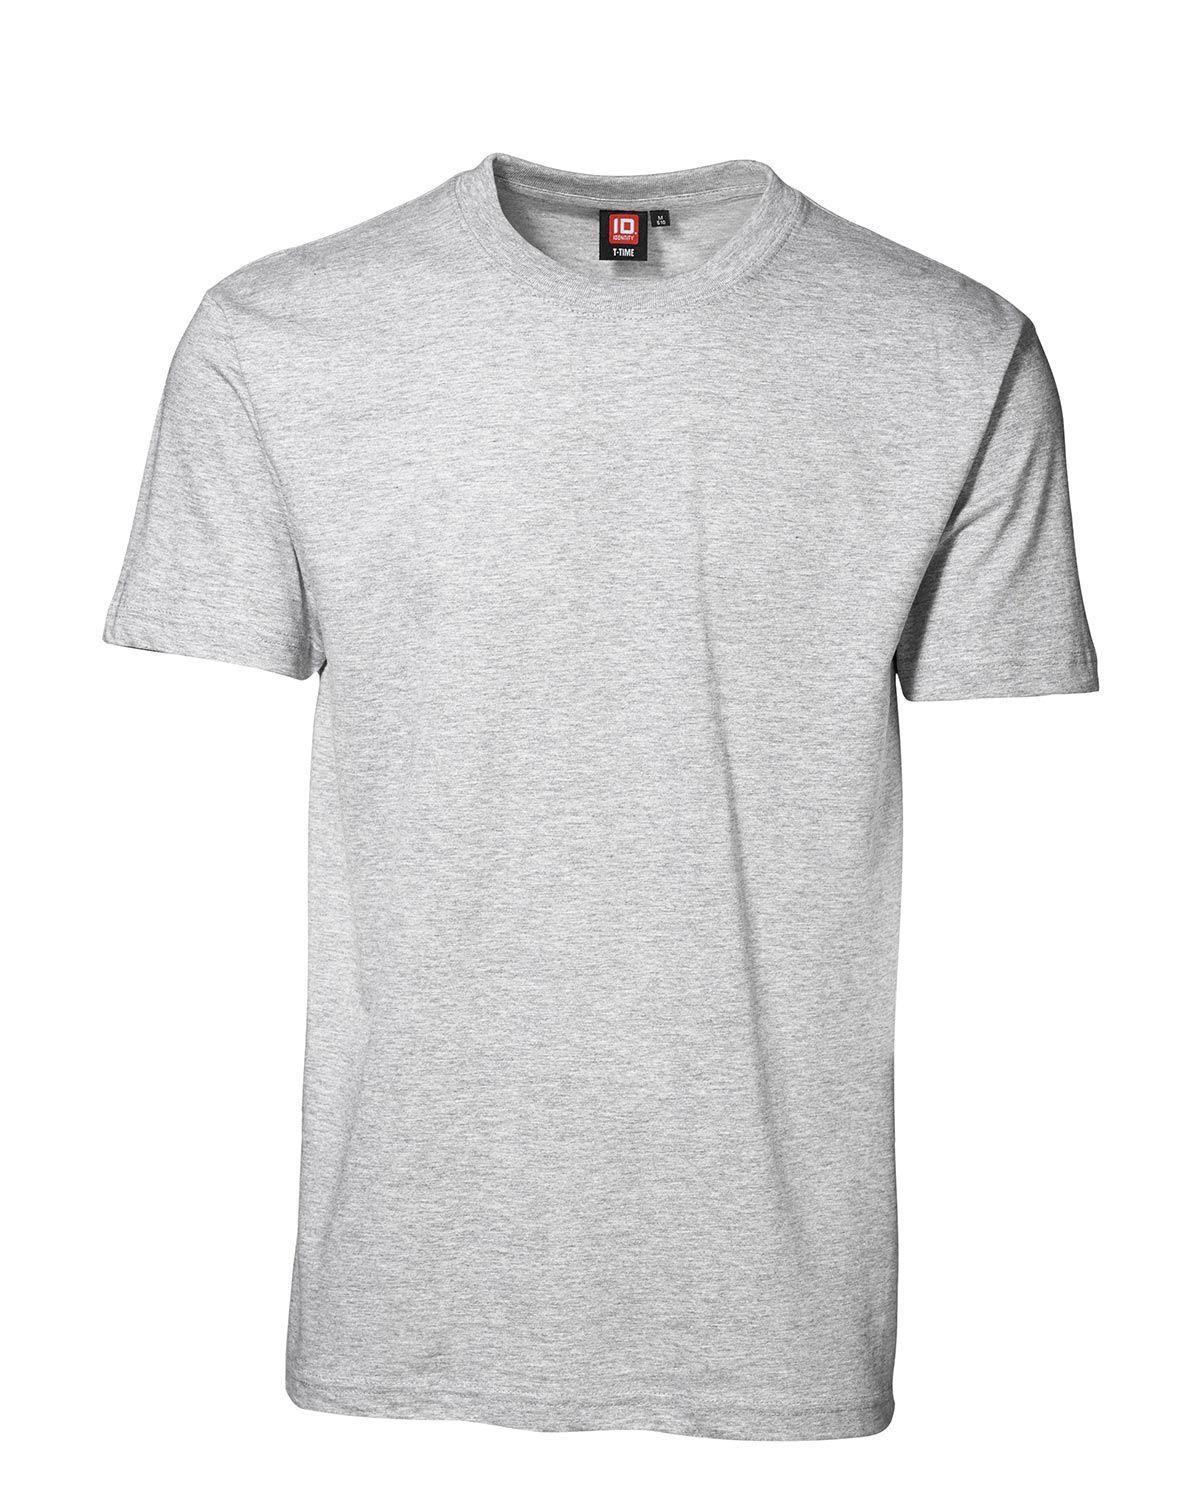 ID T-Time T-shirt, rund hals (Sne, S)